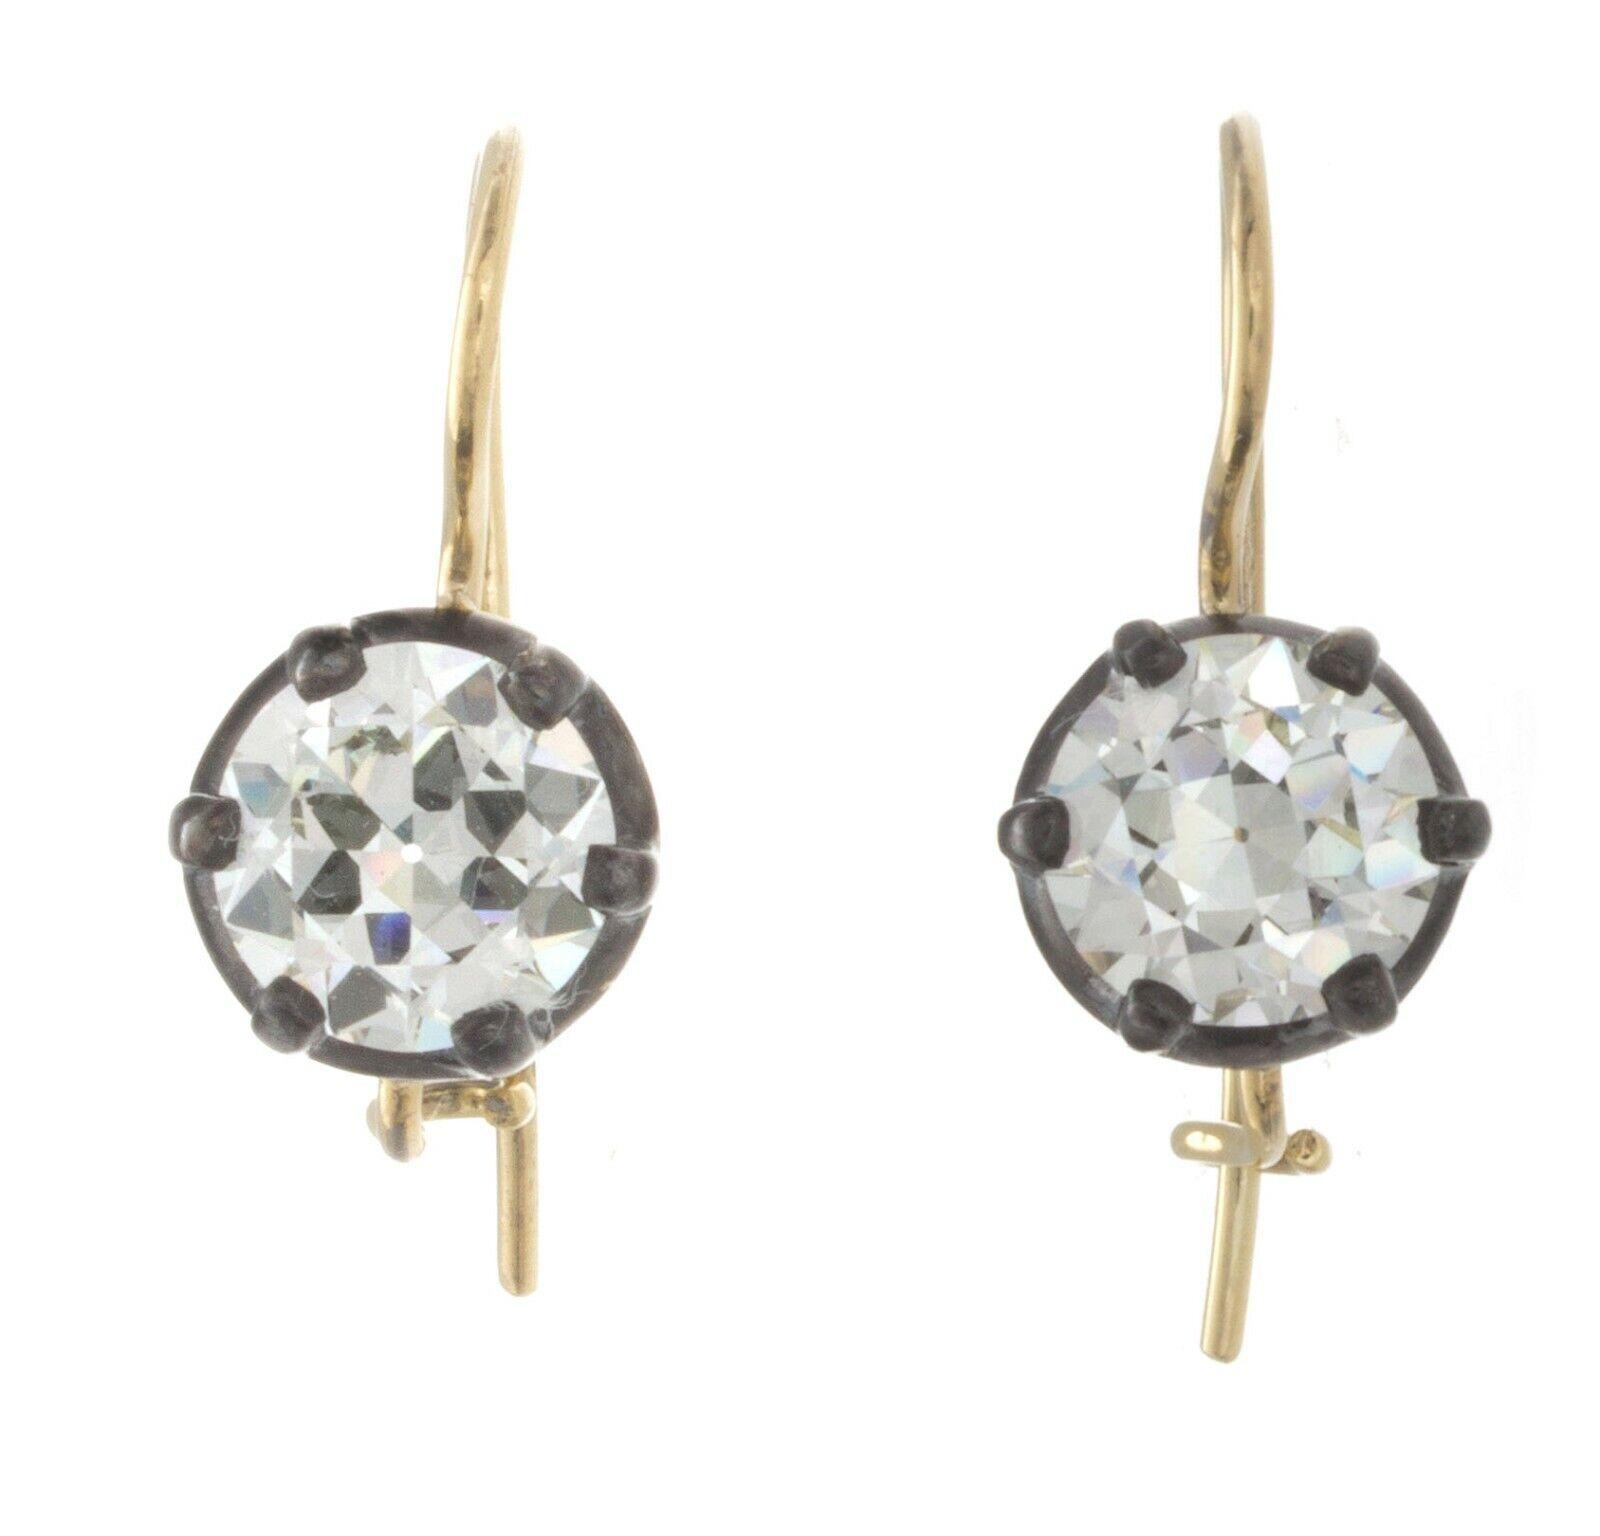 4.11ct ttw GIA Certfied Old European Cut Antique Diamond Earrings